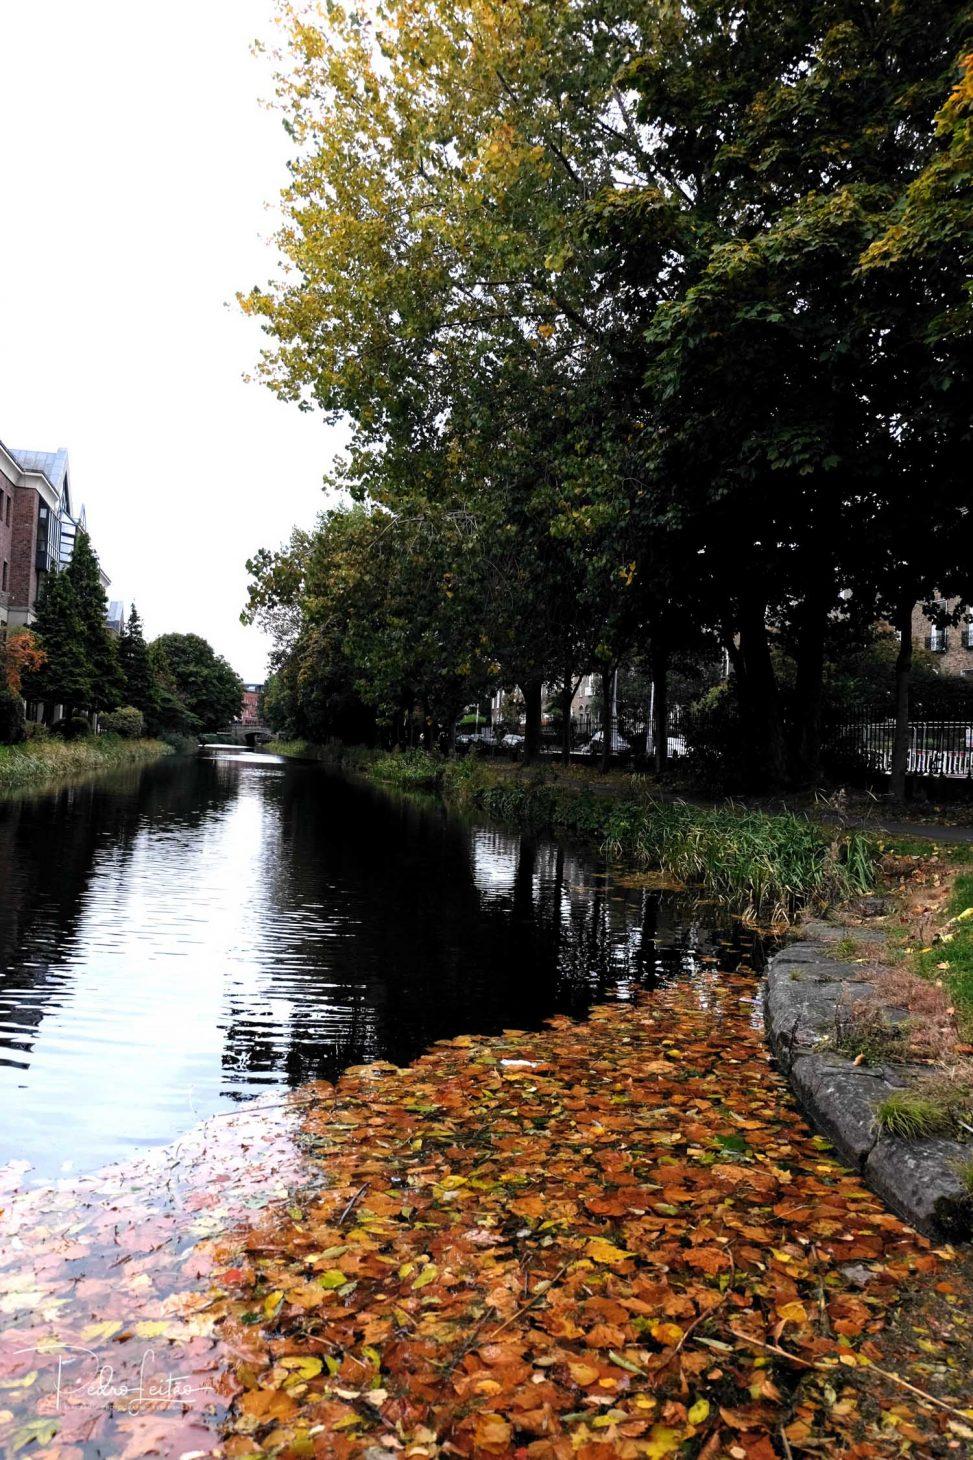 Autumn in Dublin